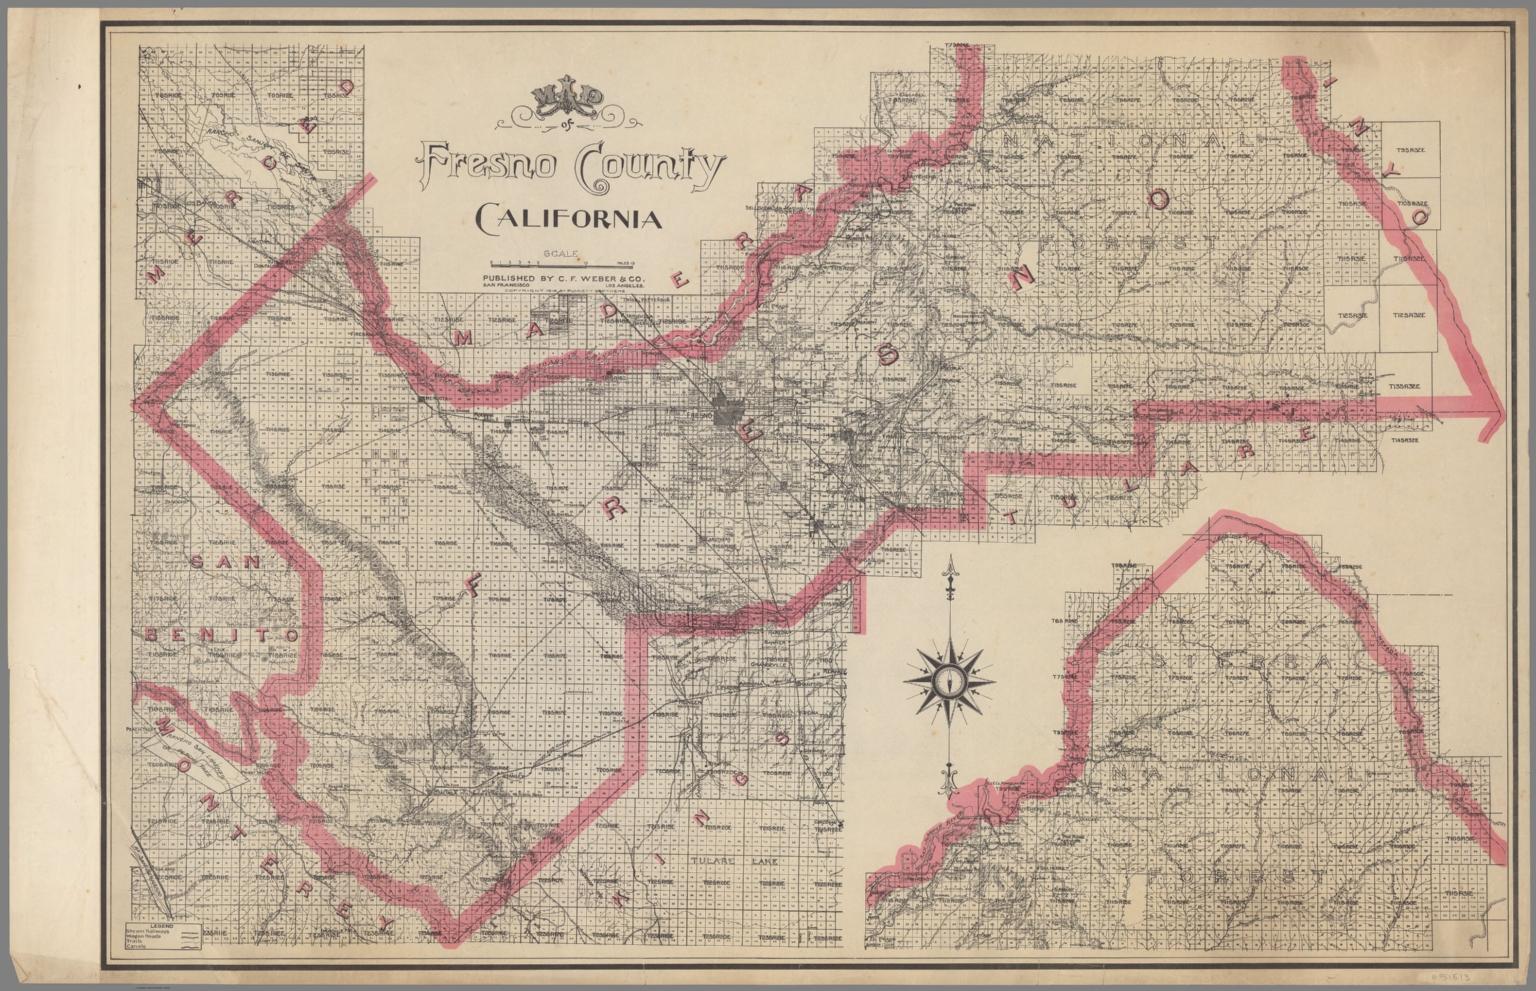 Map of Fresno County, California